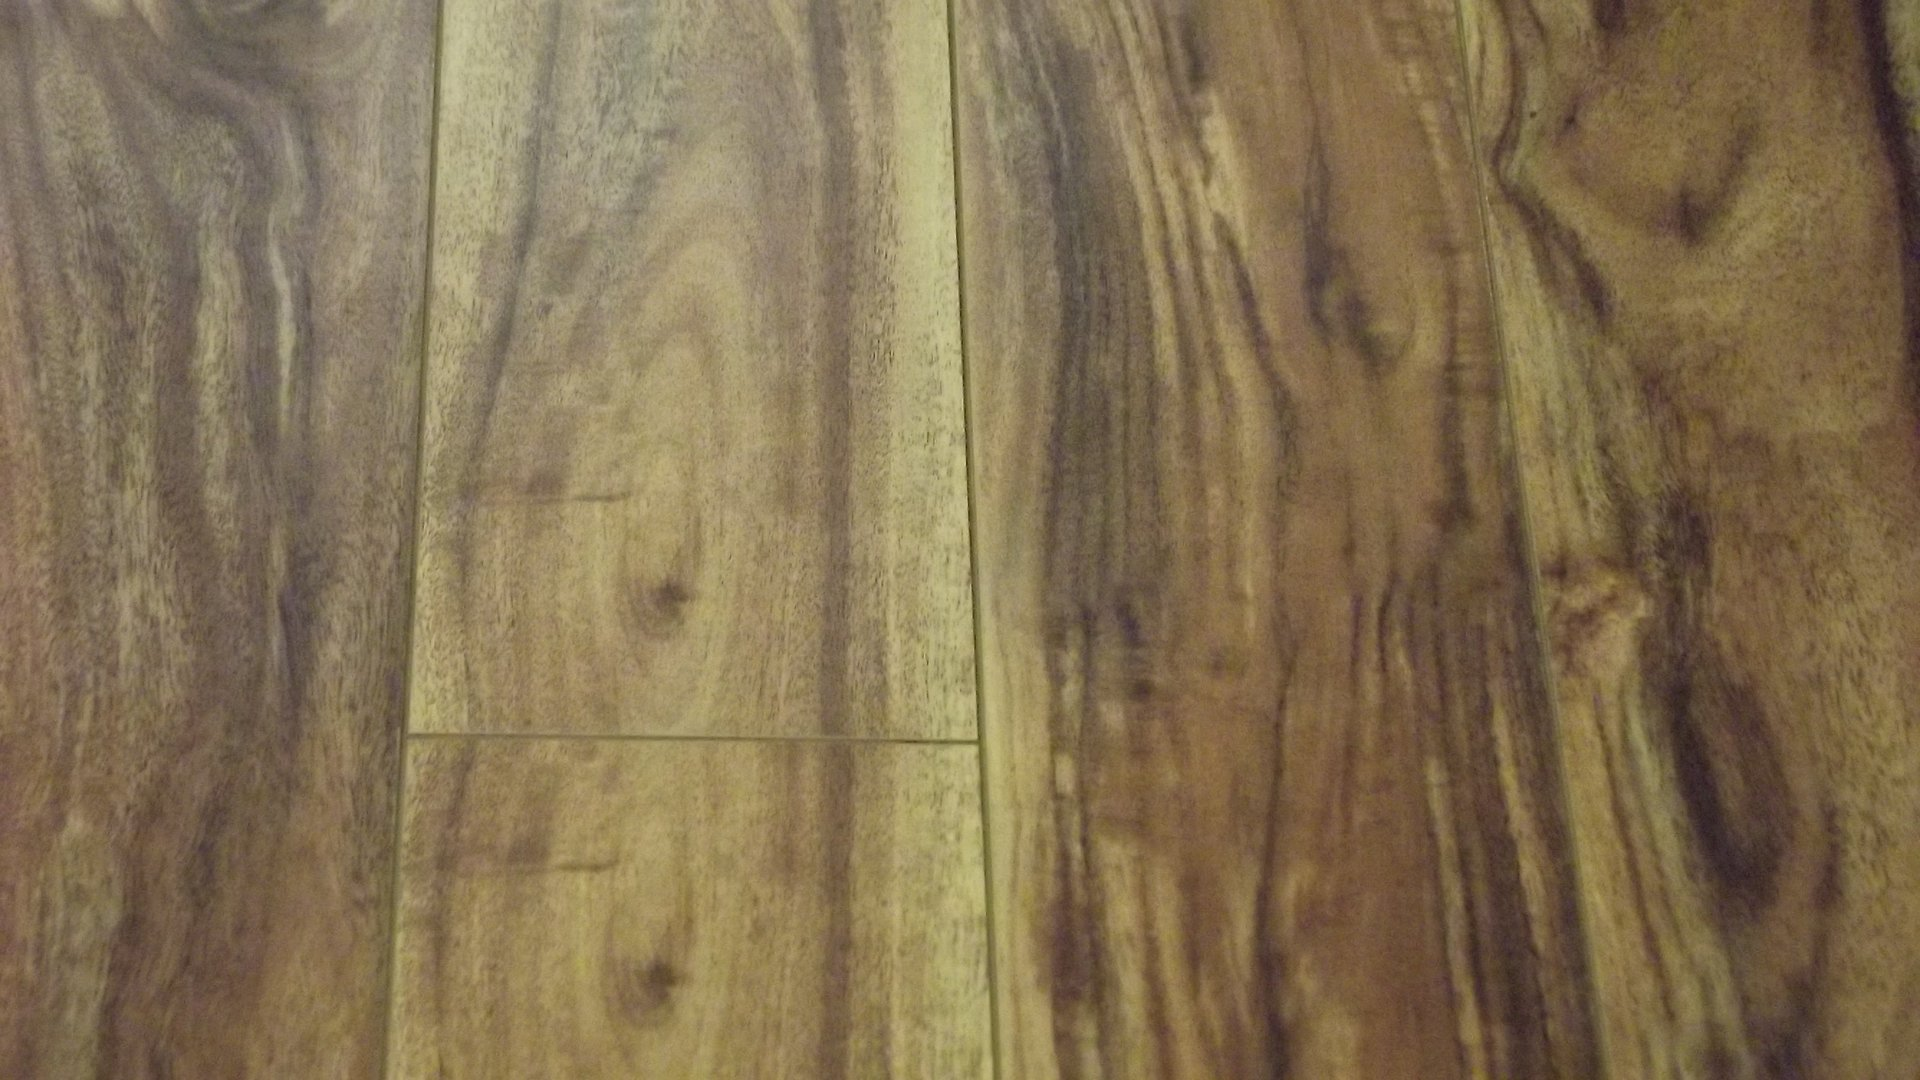 ... Laminate U0026 Wpc Floors Cost Less Carpet Spokane U0027s Highest ...